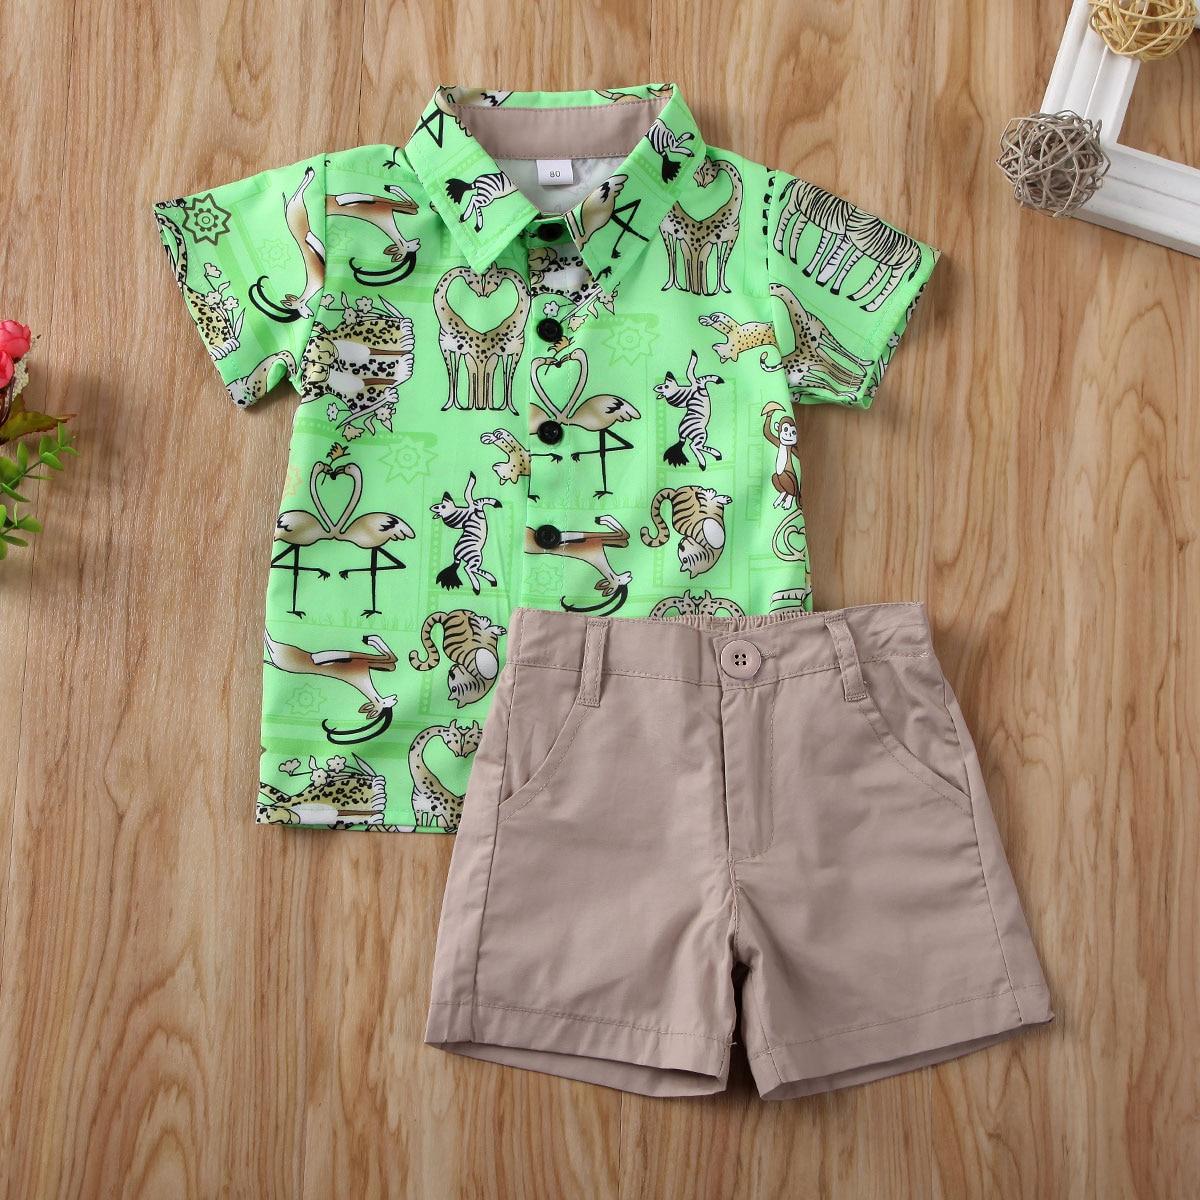 Pudcoco Toddler Baby Boy Clothes Cartoon Animals Print Short Sleeve Shirt Tops Short Pants 2Pcs Outfits Clothes